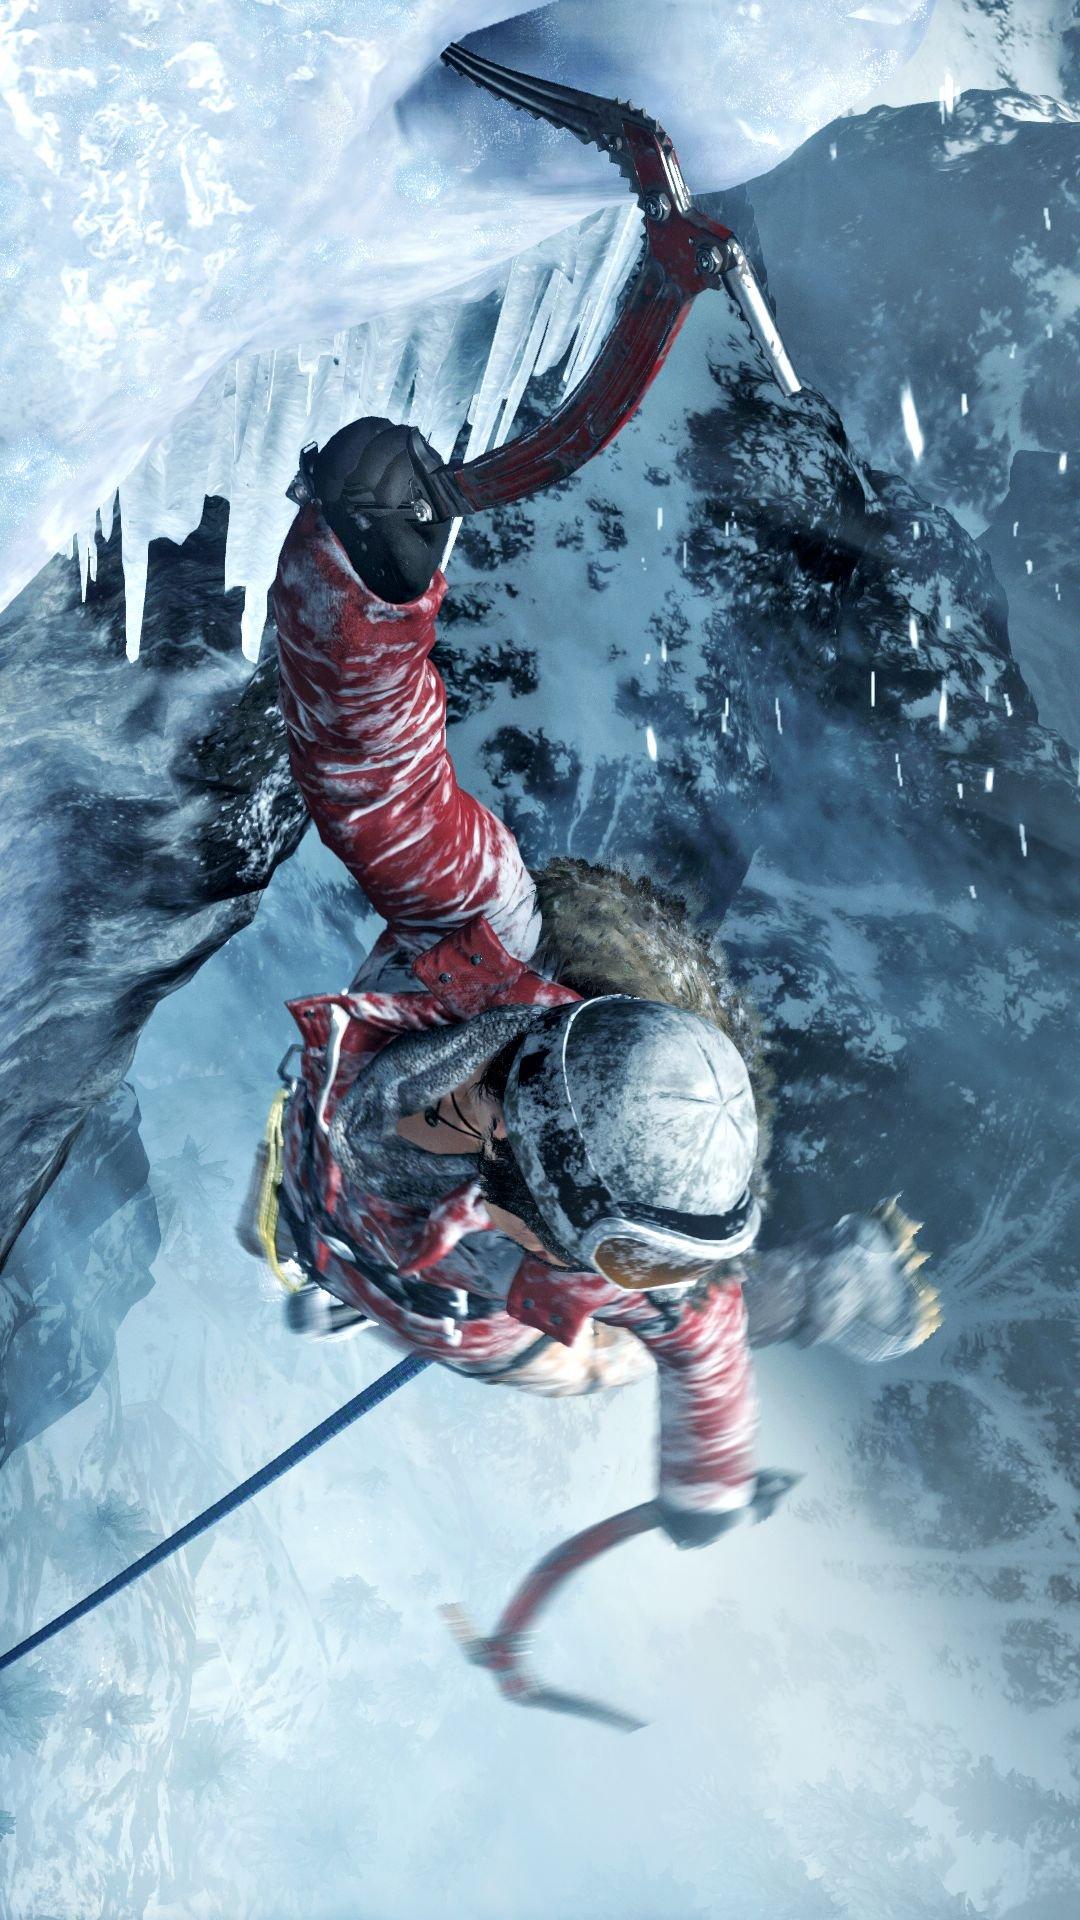 Tomb Raider Iphone 5 Wallpaper New Rise Of The Tomb Raider 1080p Xbox One Screenshots